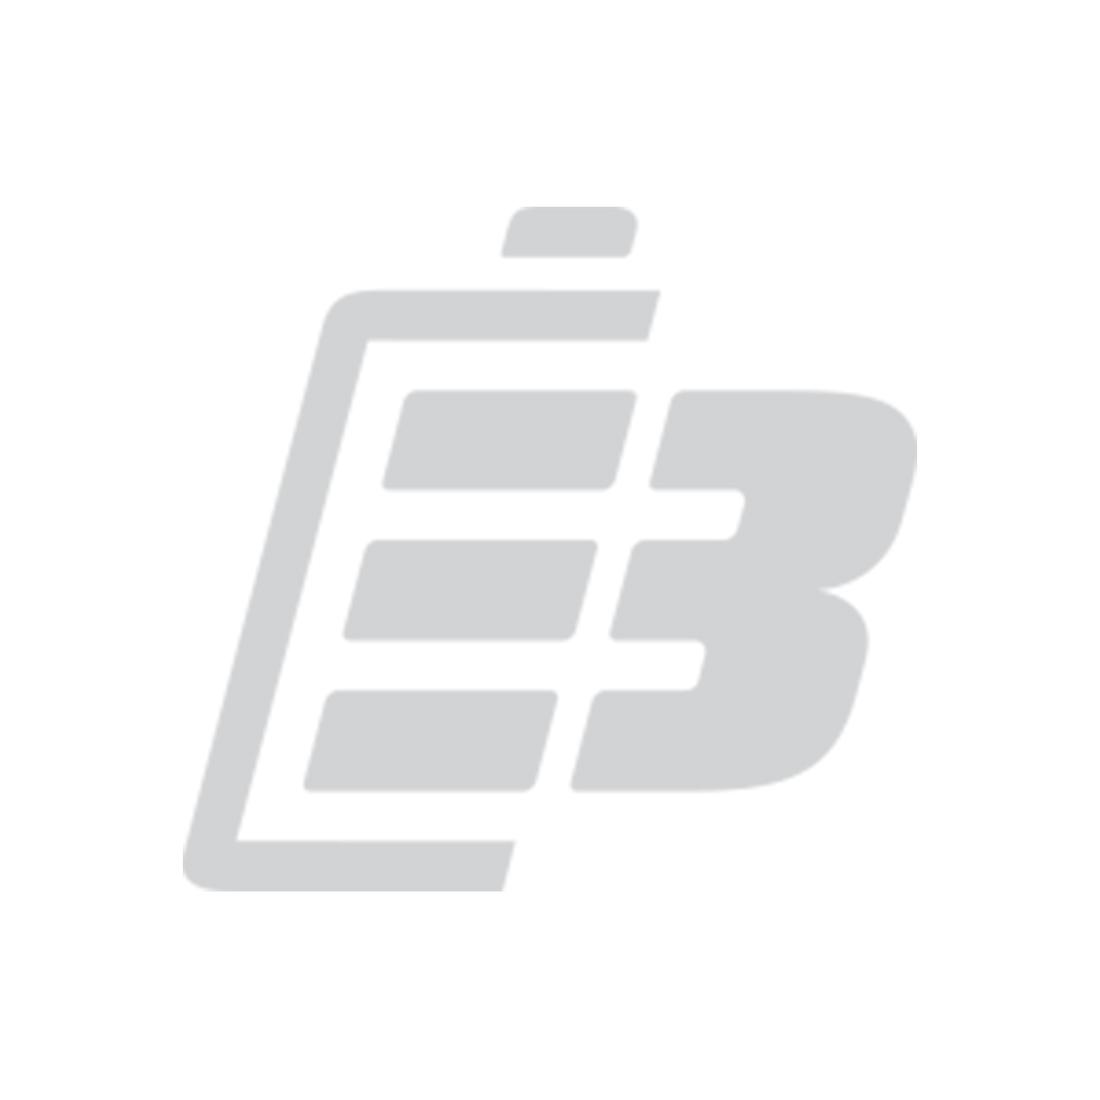 Laptop battery Acer Aspire E5-575_1